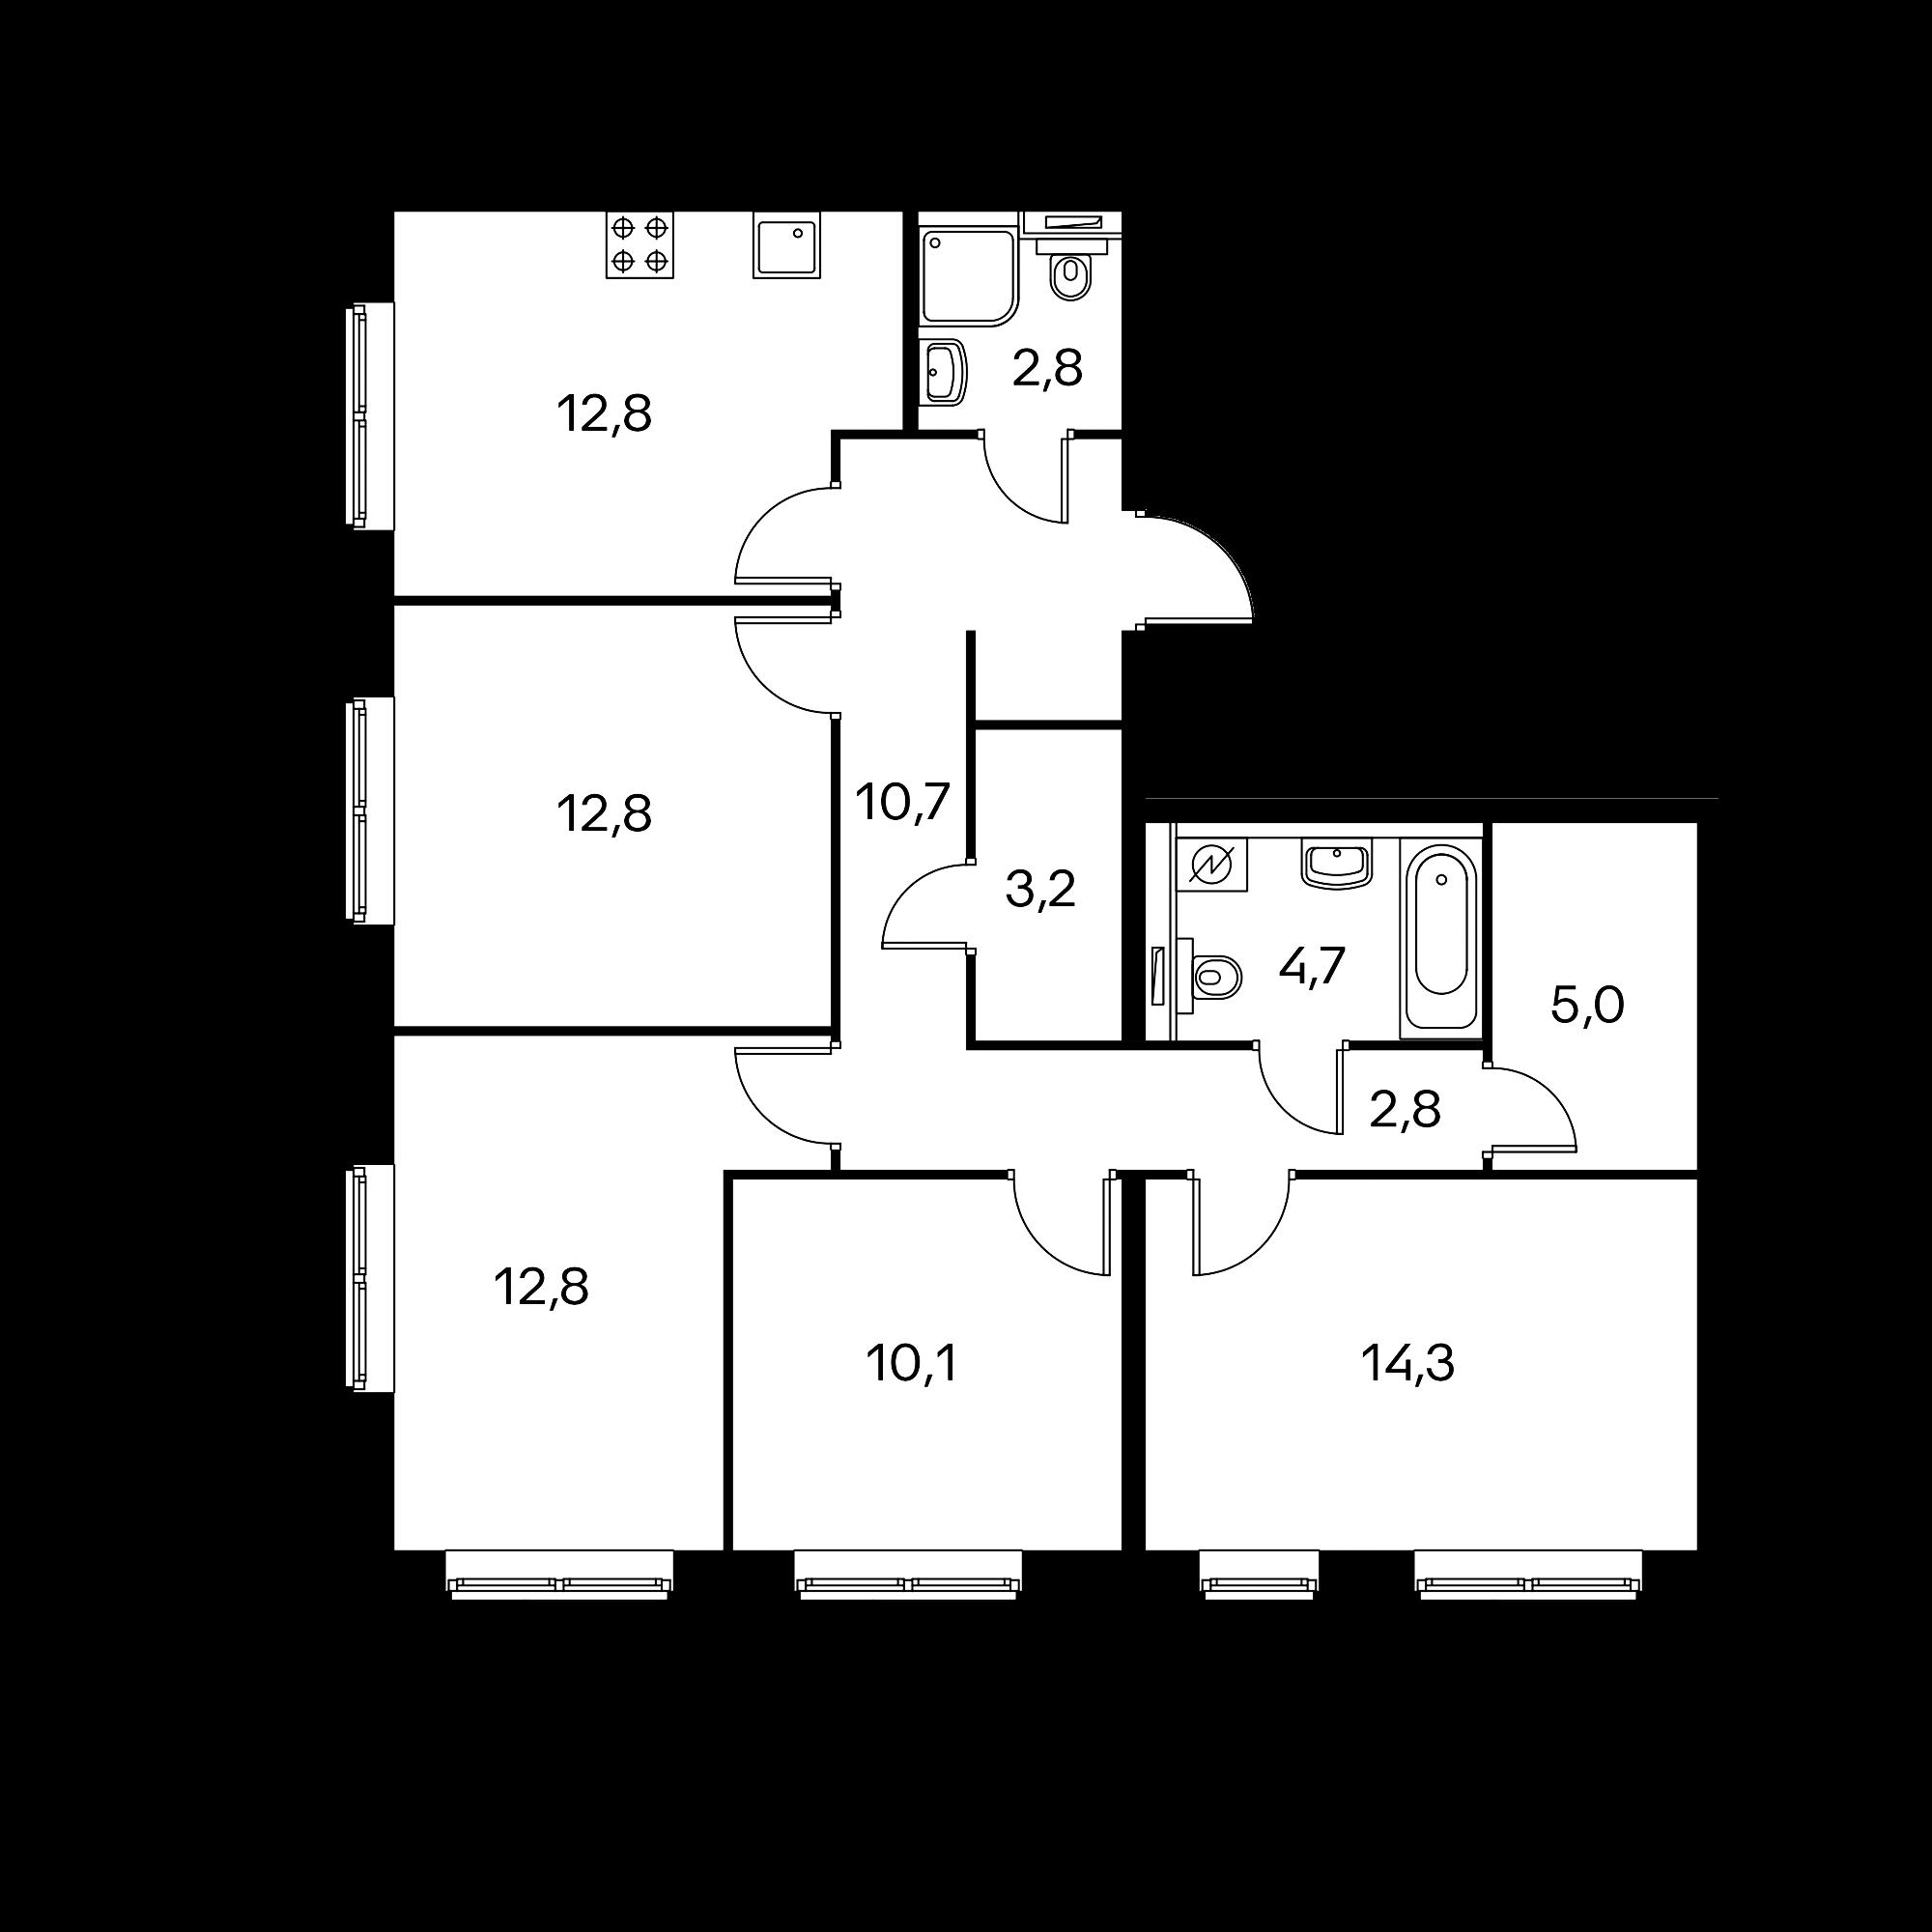 4KM8_11.1-1_C_A_1